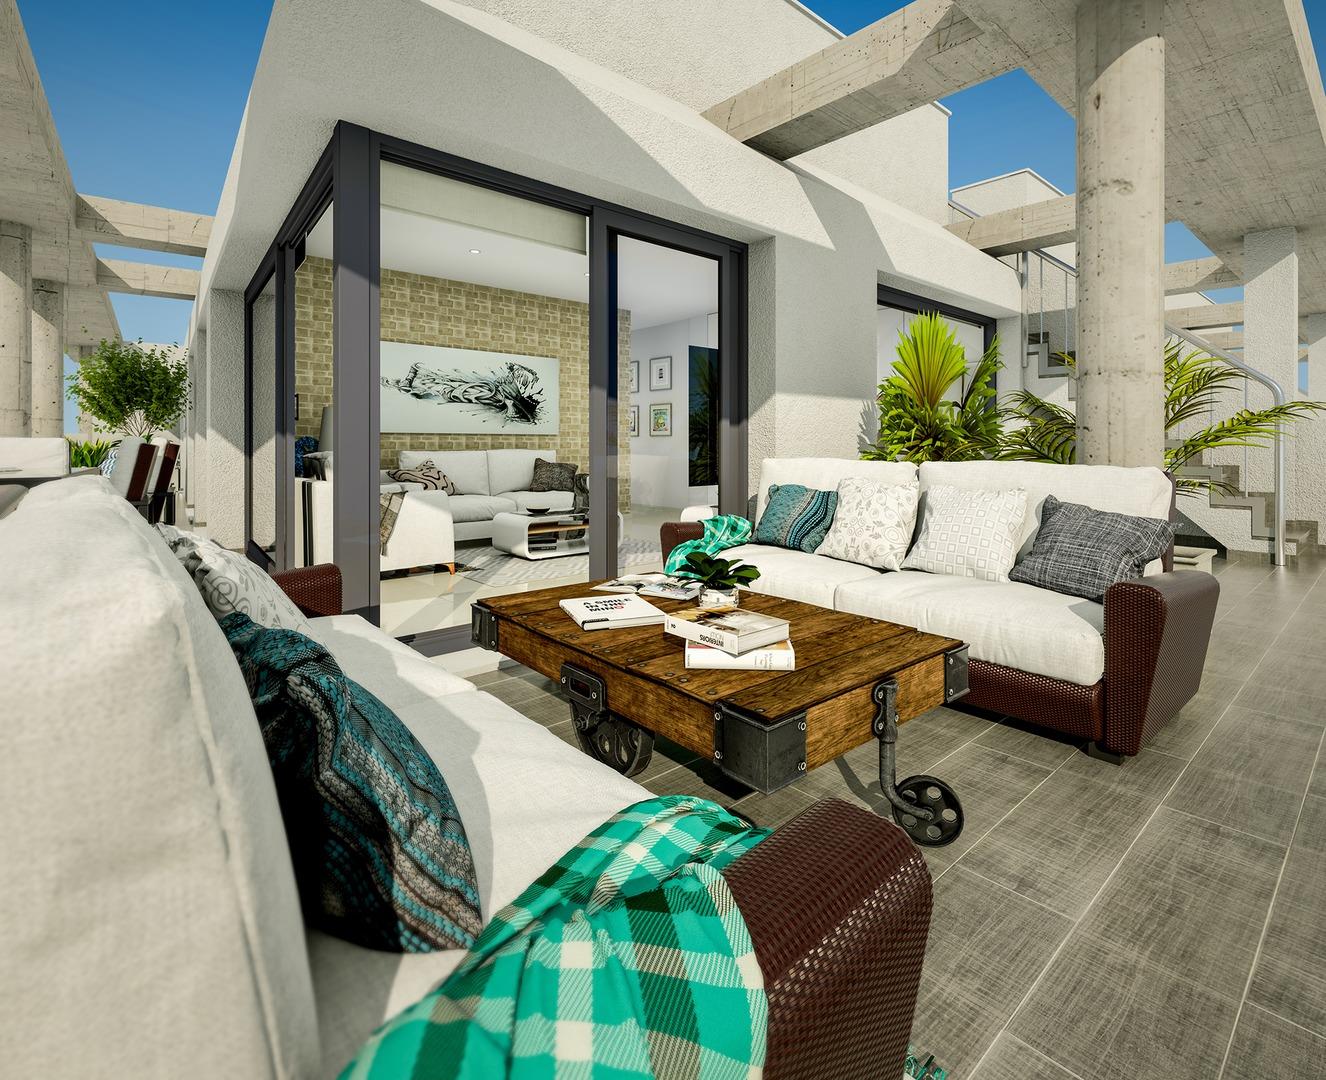 Spacious sunny apartments with terrace and solarium - AM1537